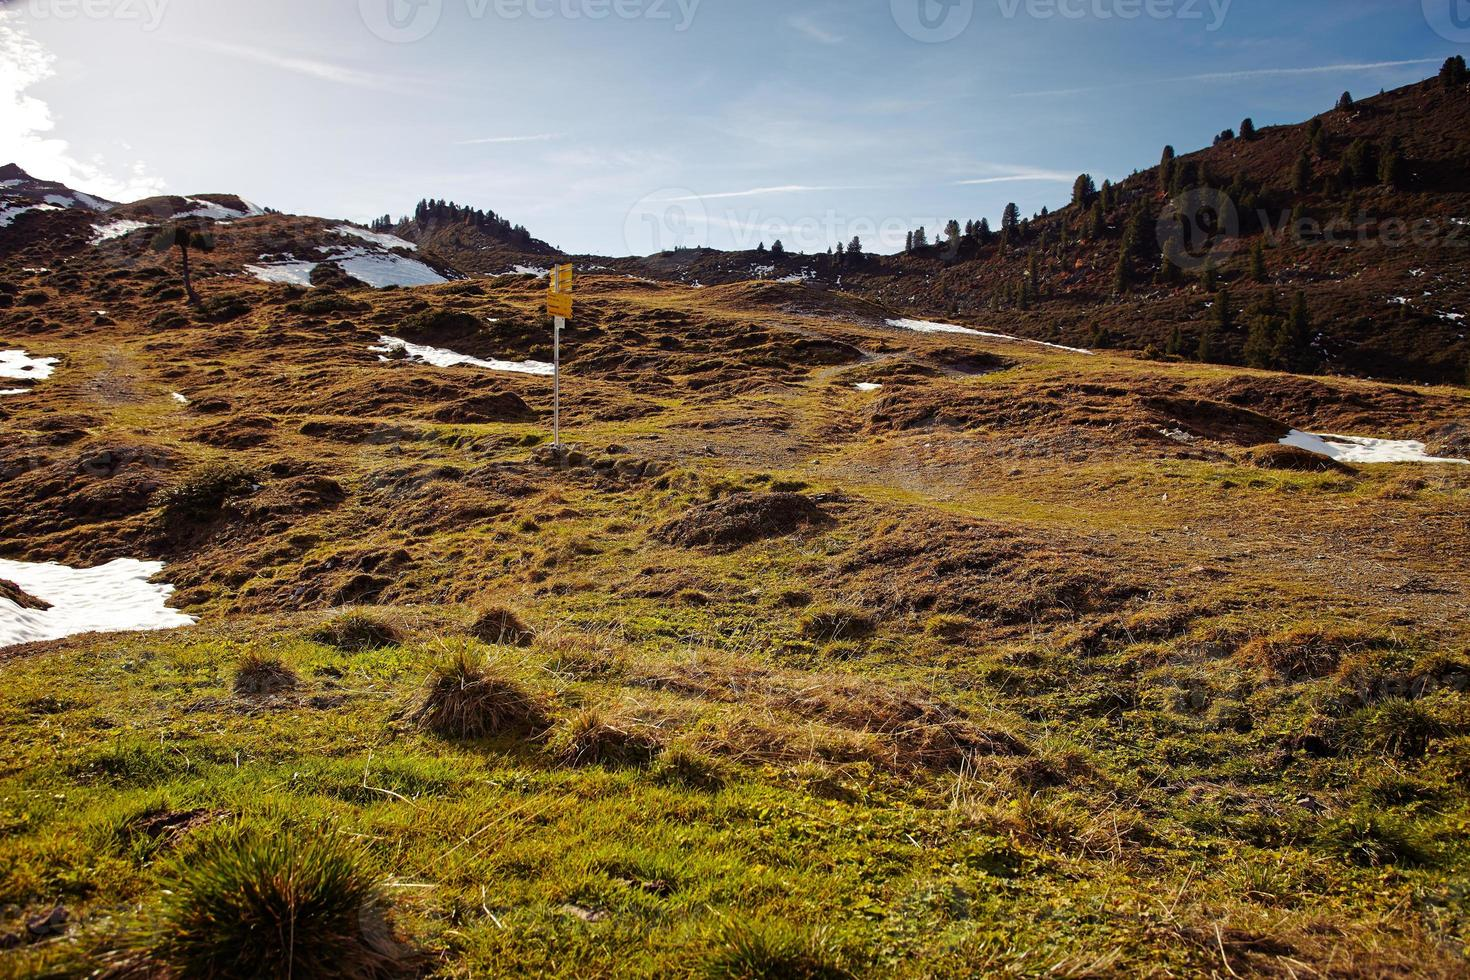 vandringsområde i natursköna alper foto